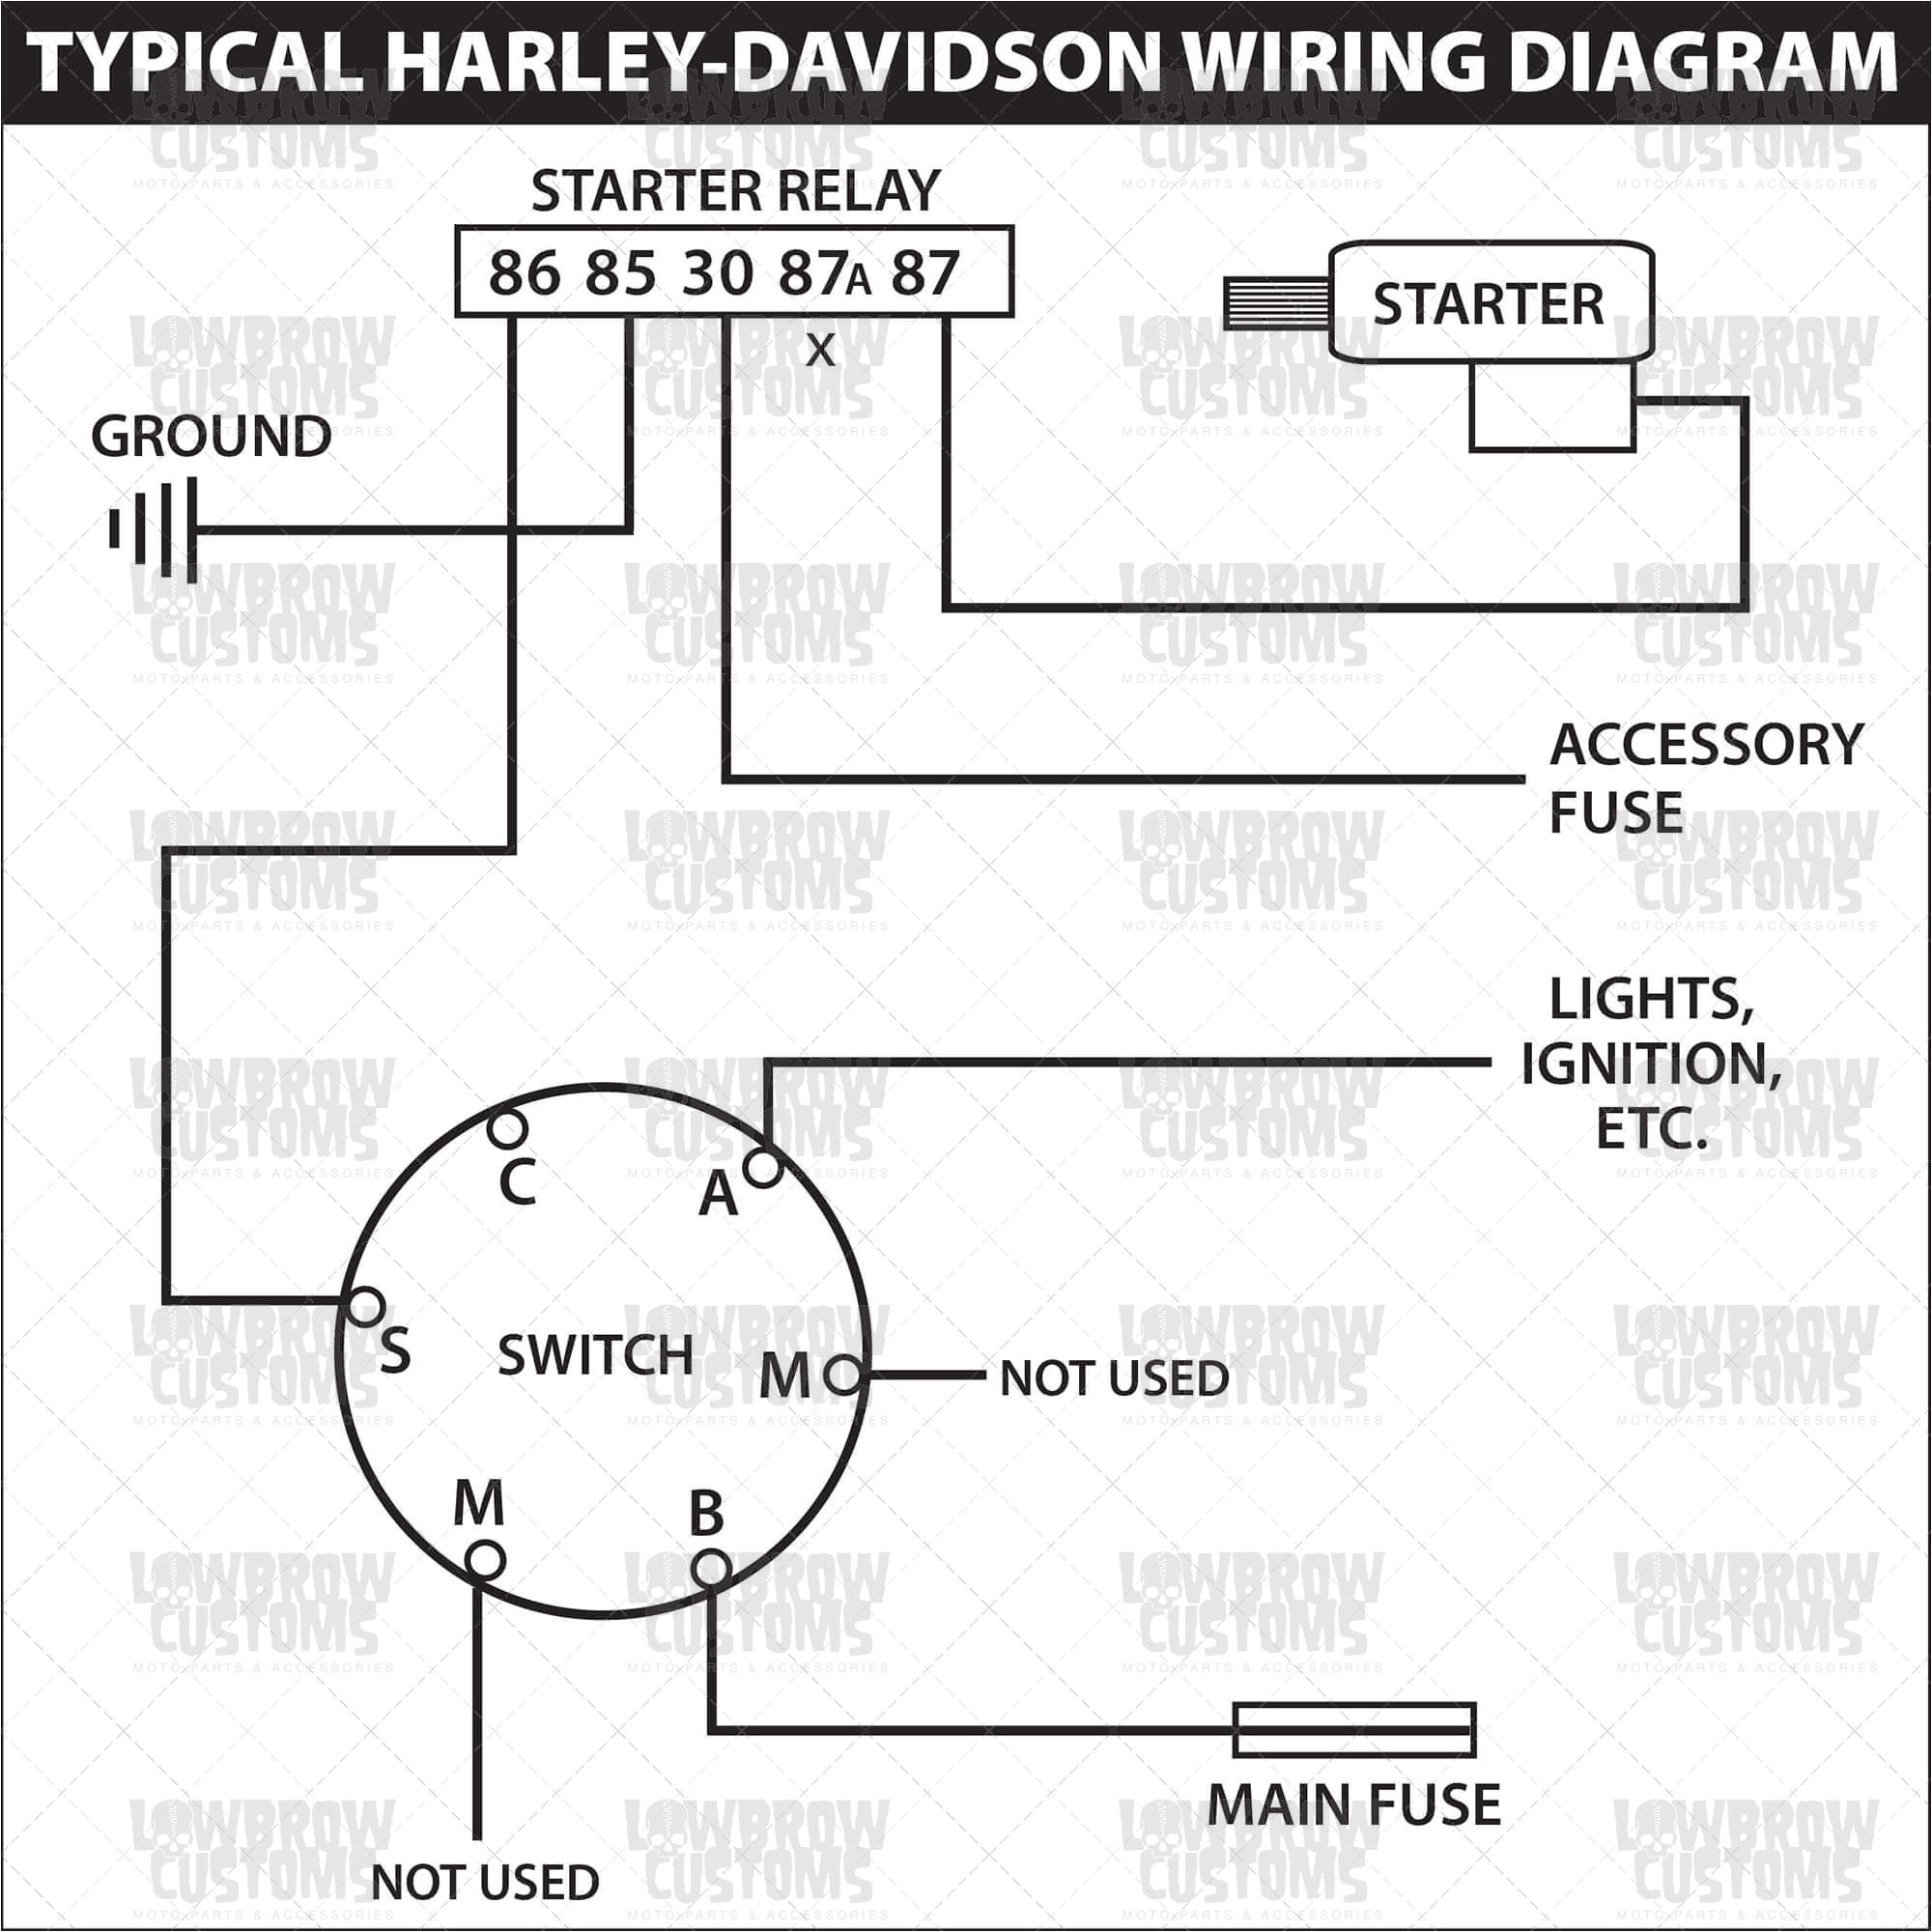 wiring diagram key switch zen templates diagnostics circuits universal ignition circuit wiring inverter circuit using mosfet circuits and symbols dark sensor ldr oscilloscope symbol stereo jpg